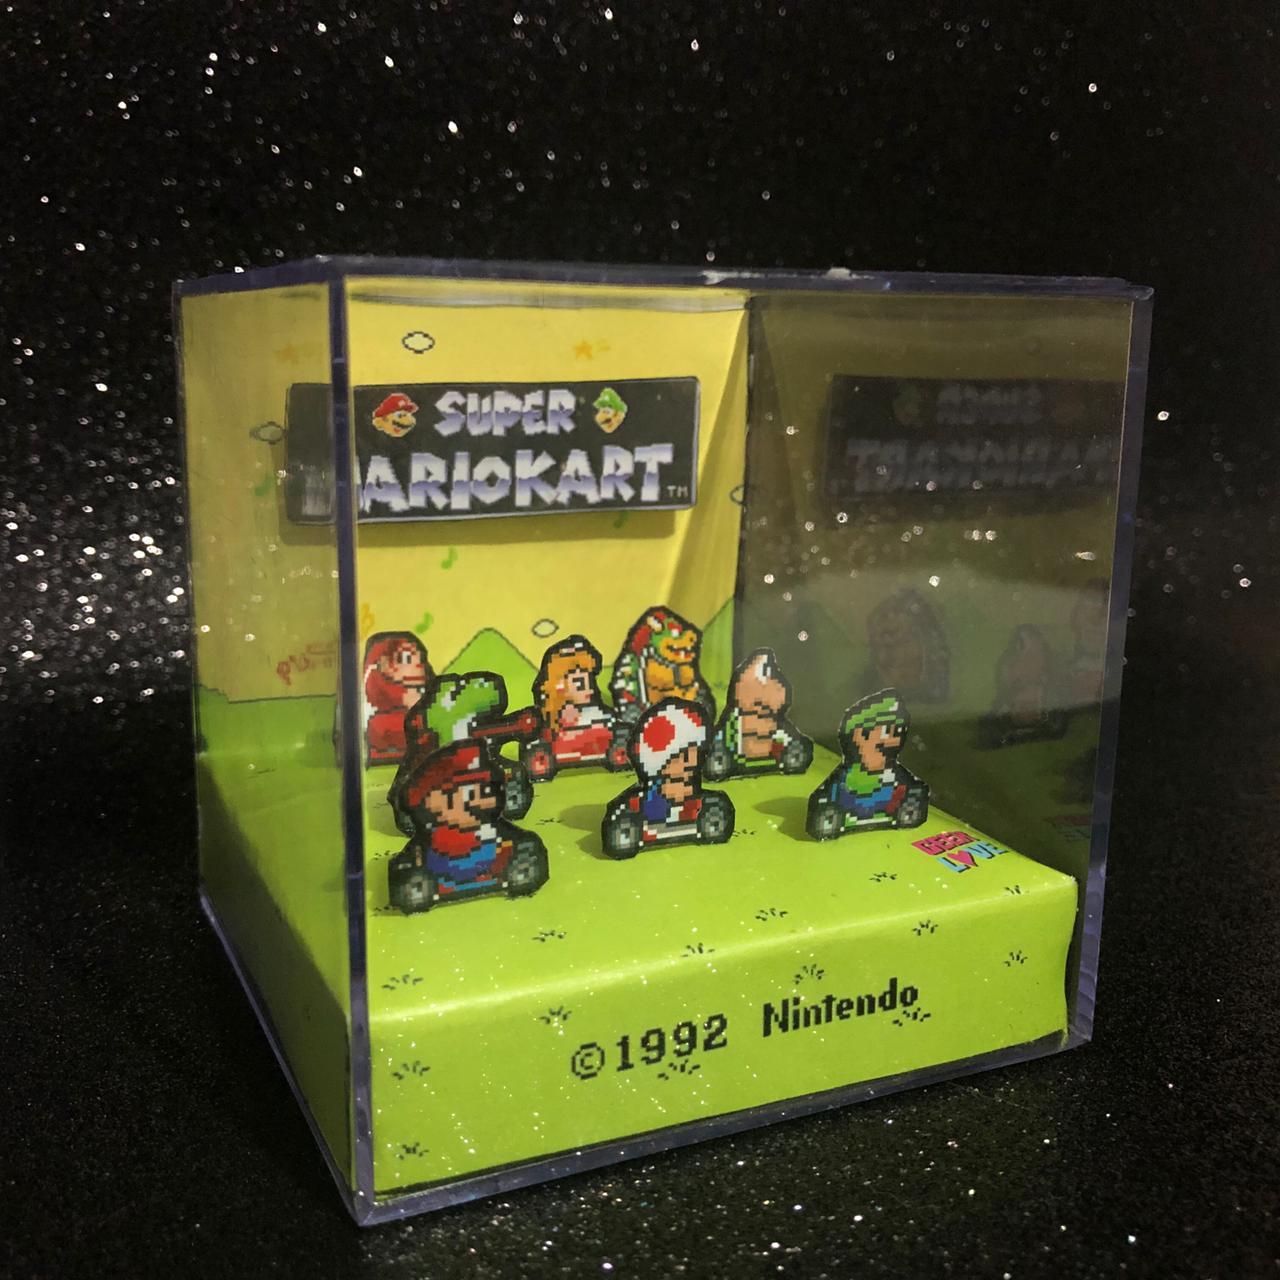 Geek Love Cubo - Super Mario Kart